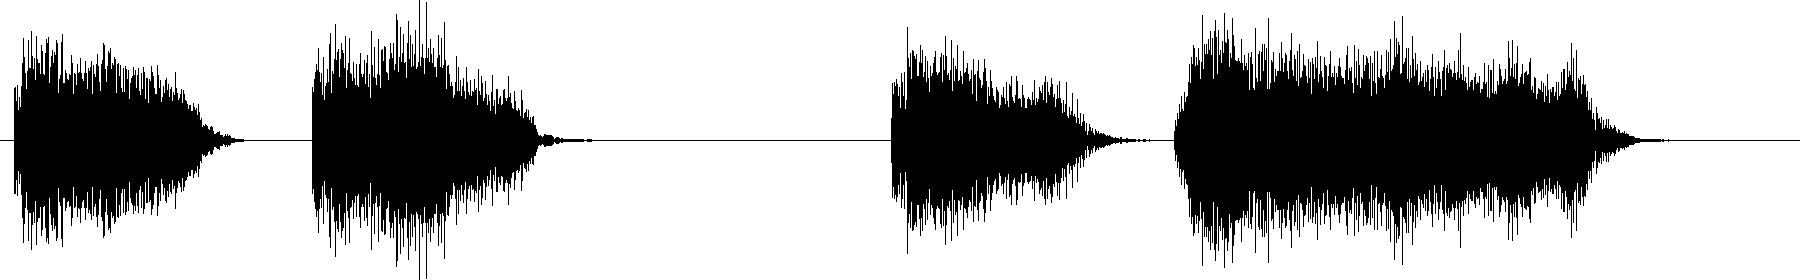 vocal fx   naming uplifting trance genre 133 bpm